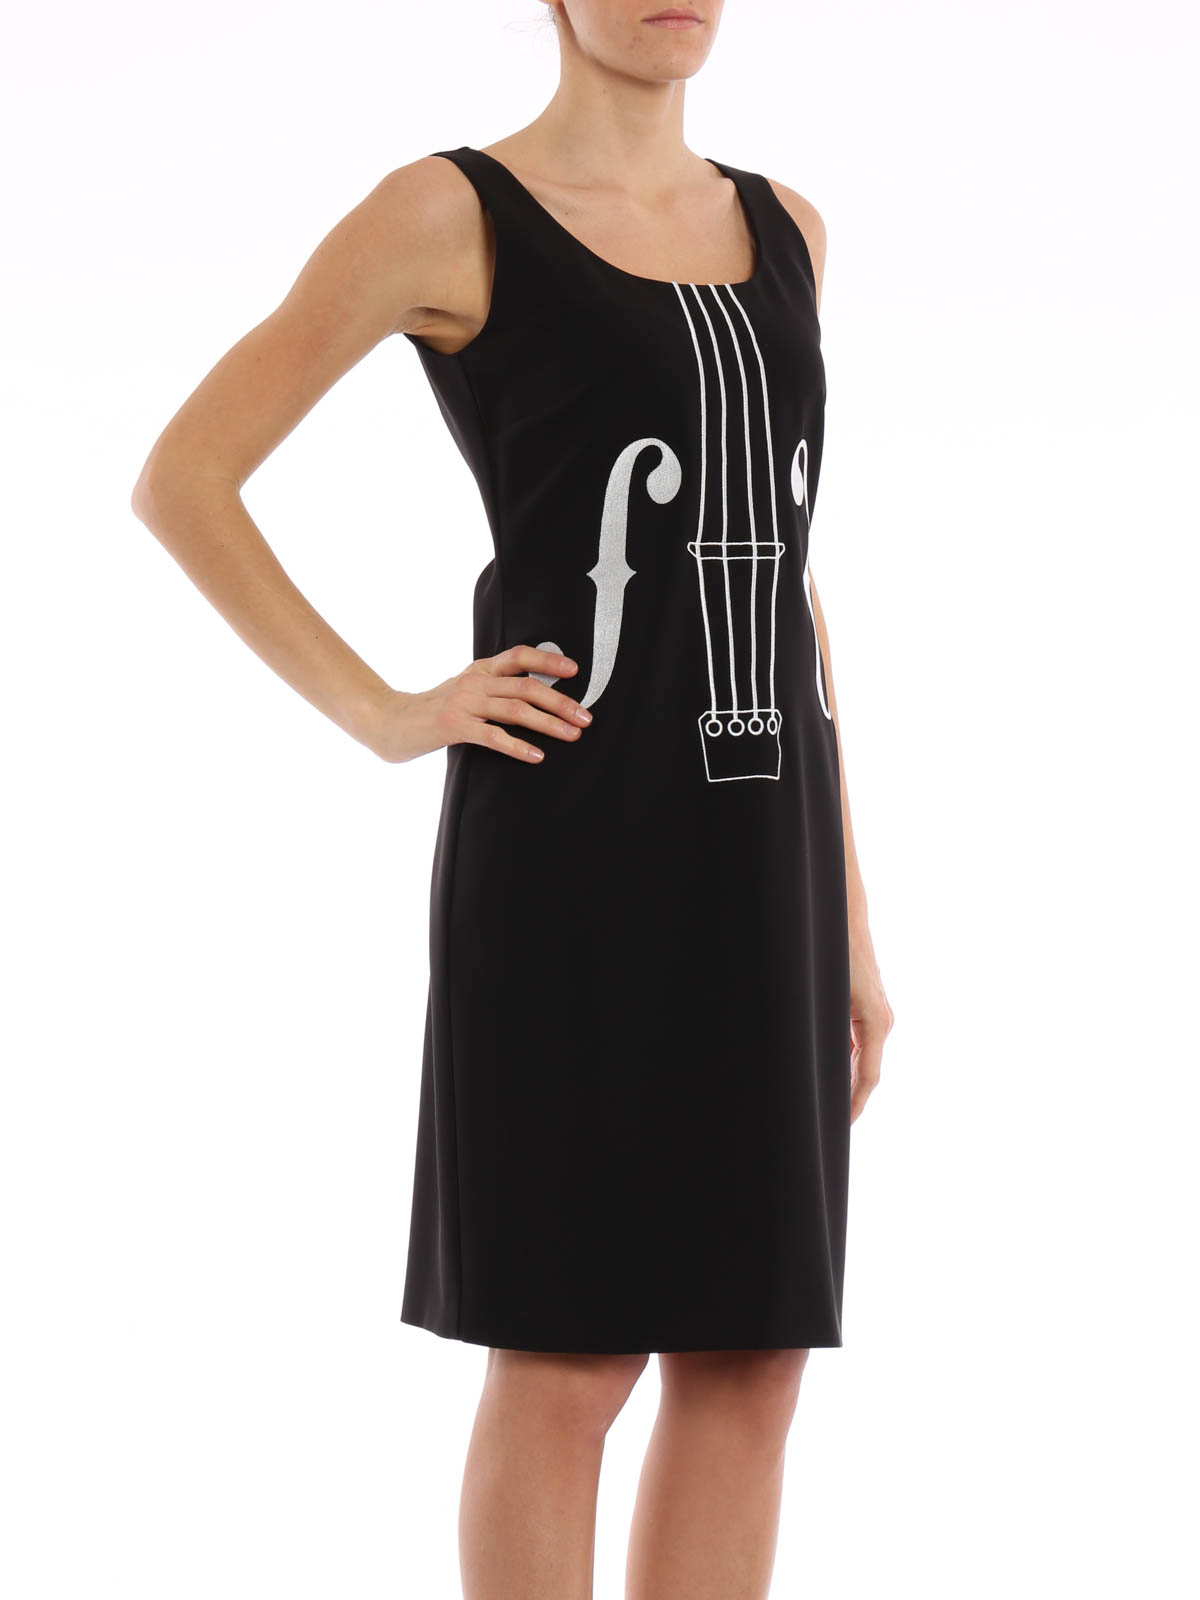 iKRIX Moschino Boutique  knee length dresses - Violin embroidery sheath  dress c5d4965d85d1